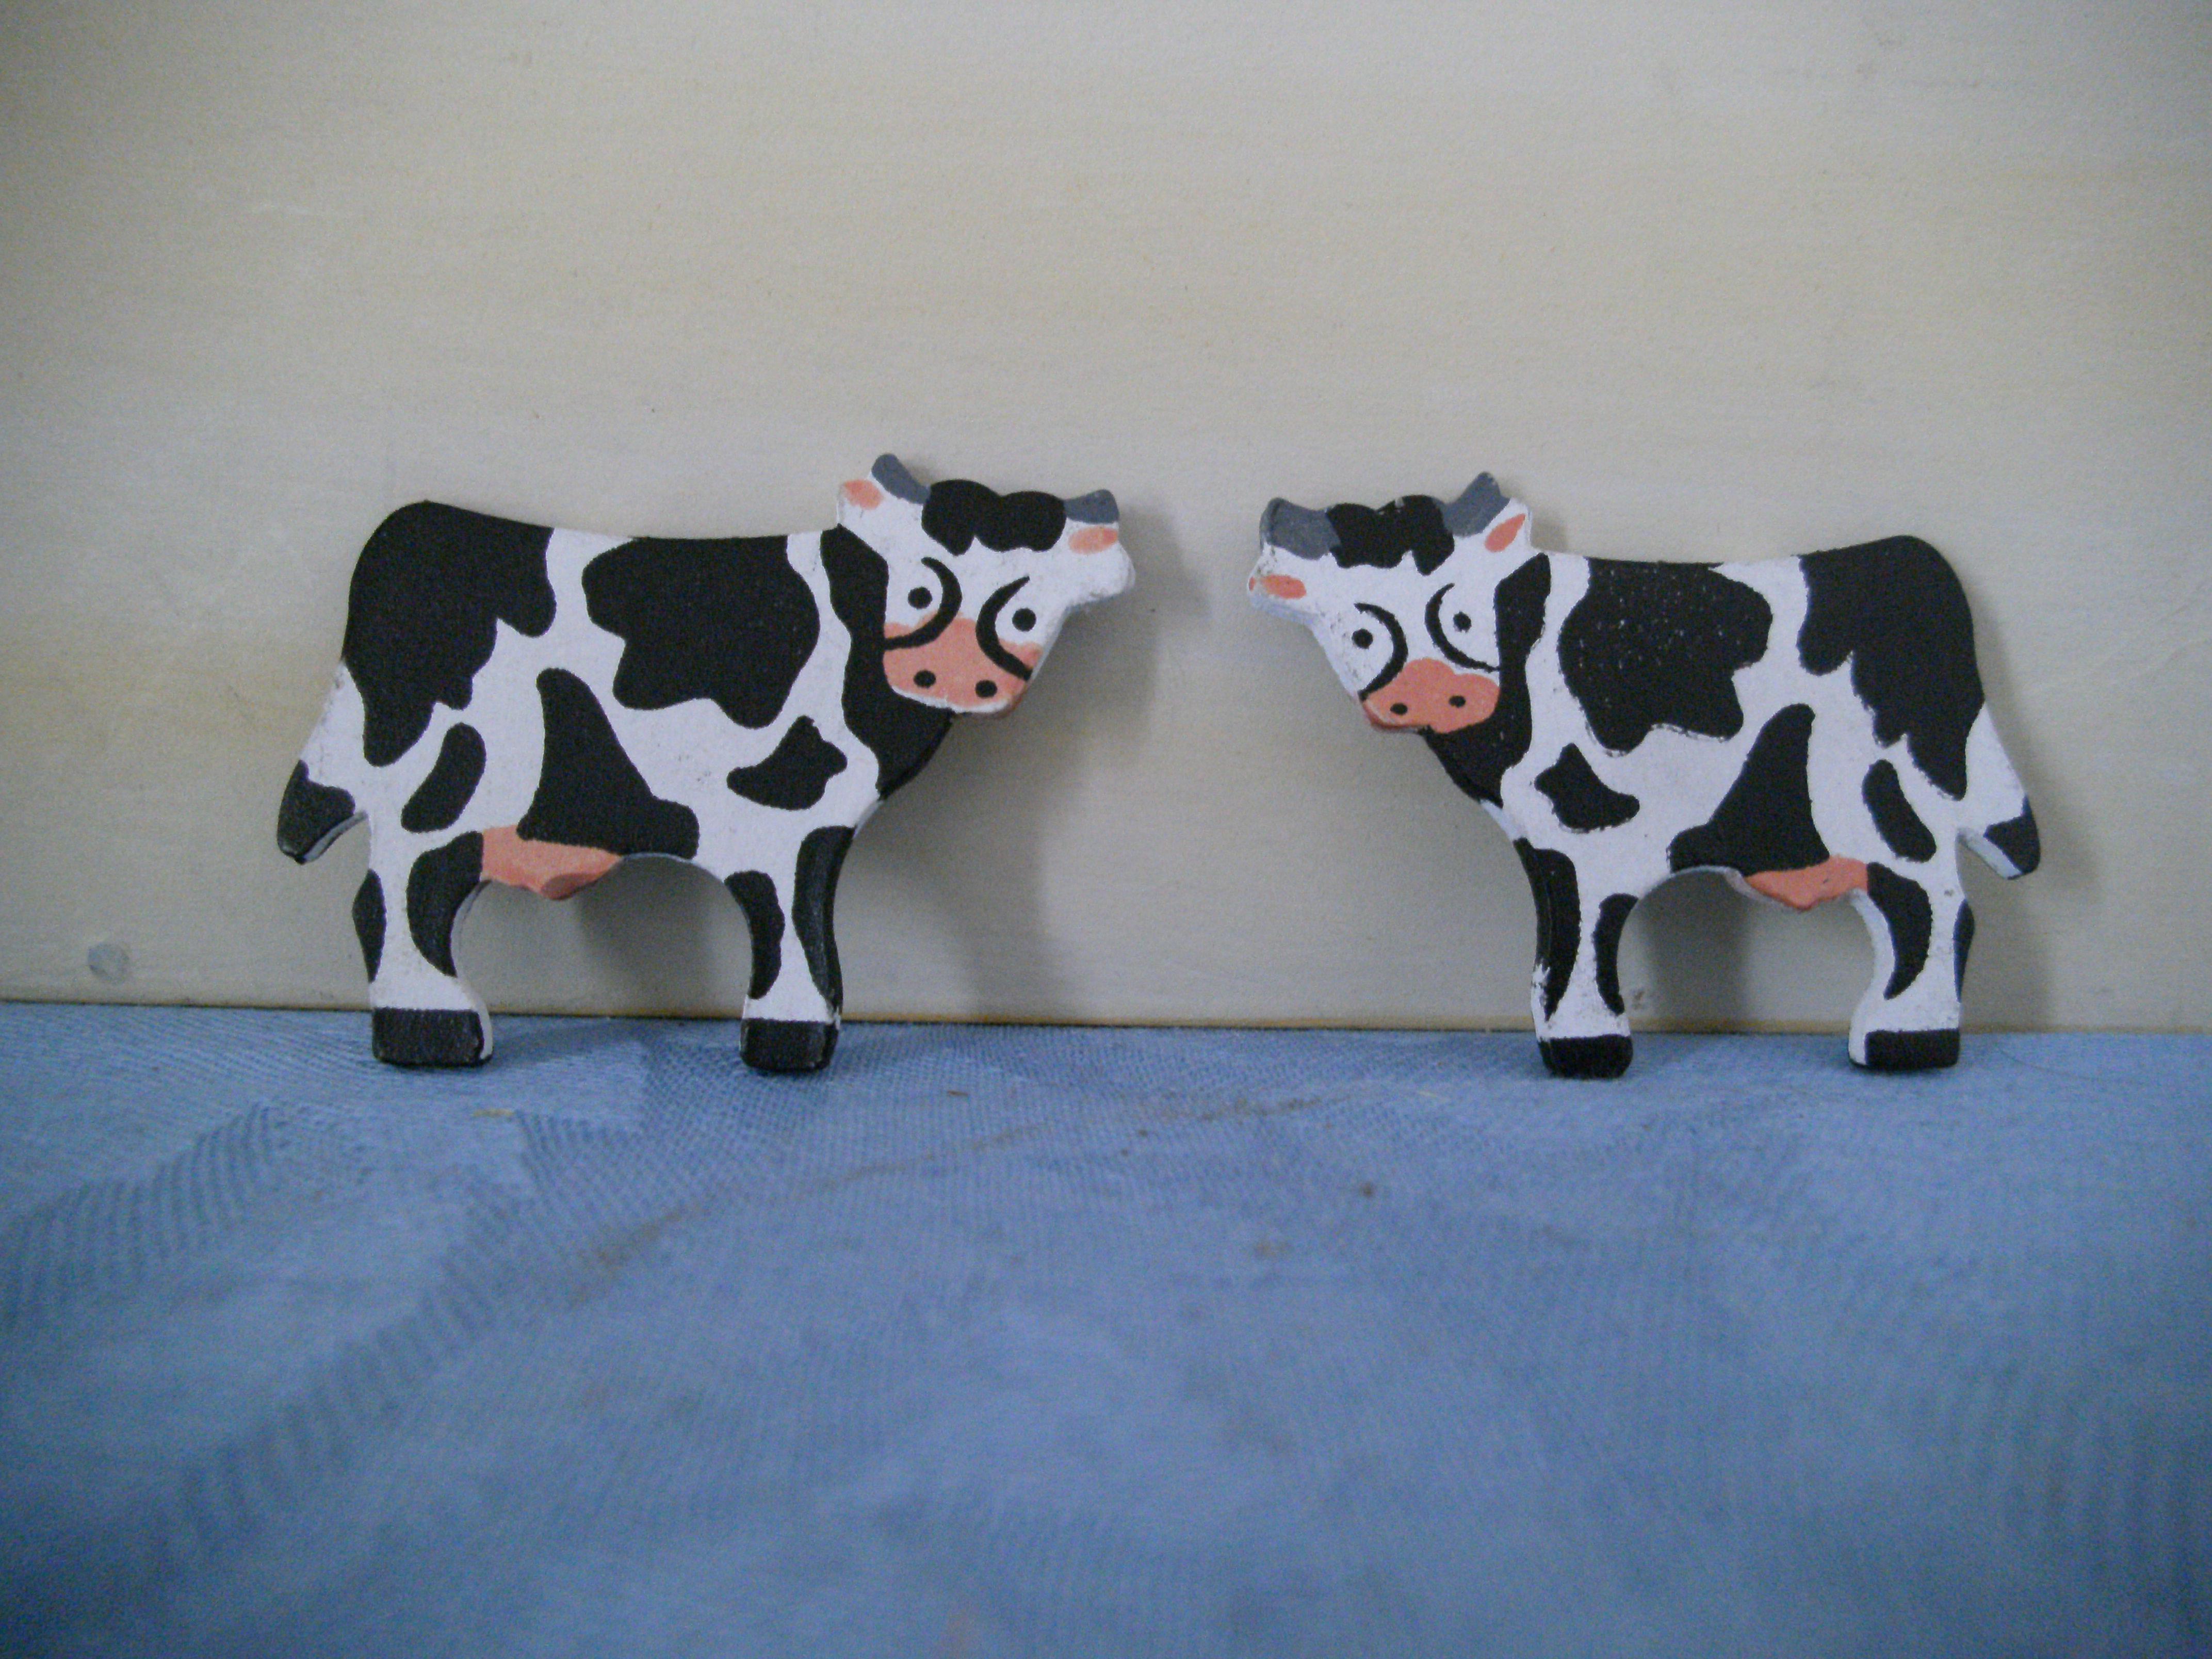 Streuteile Kuh Art Fun